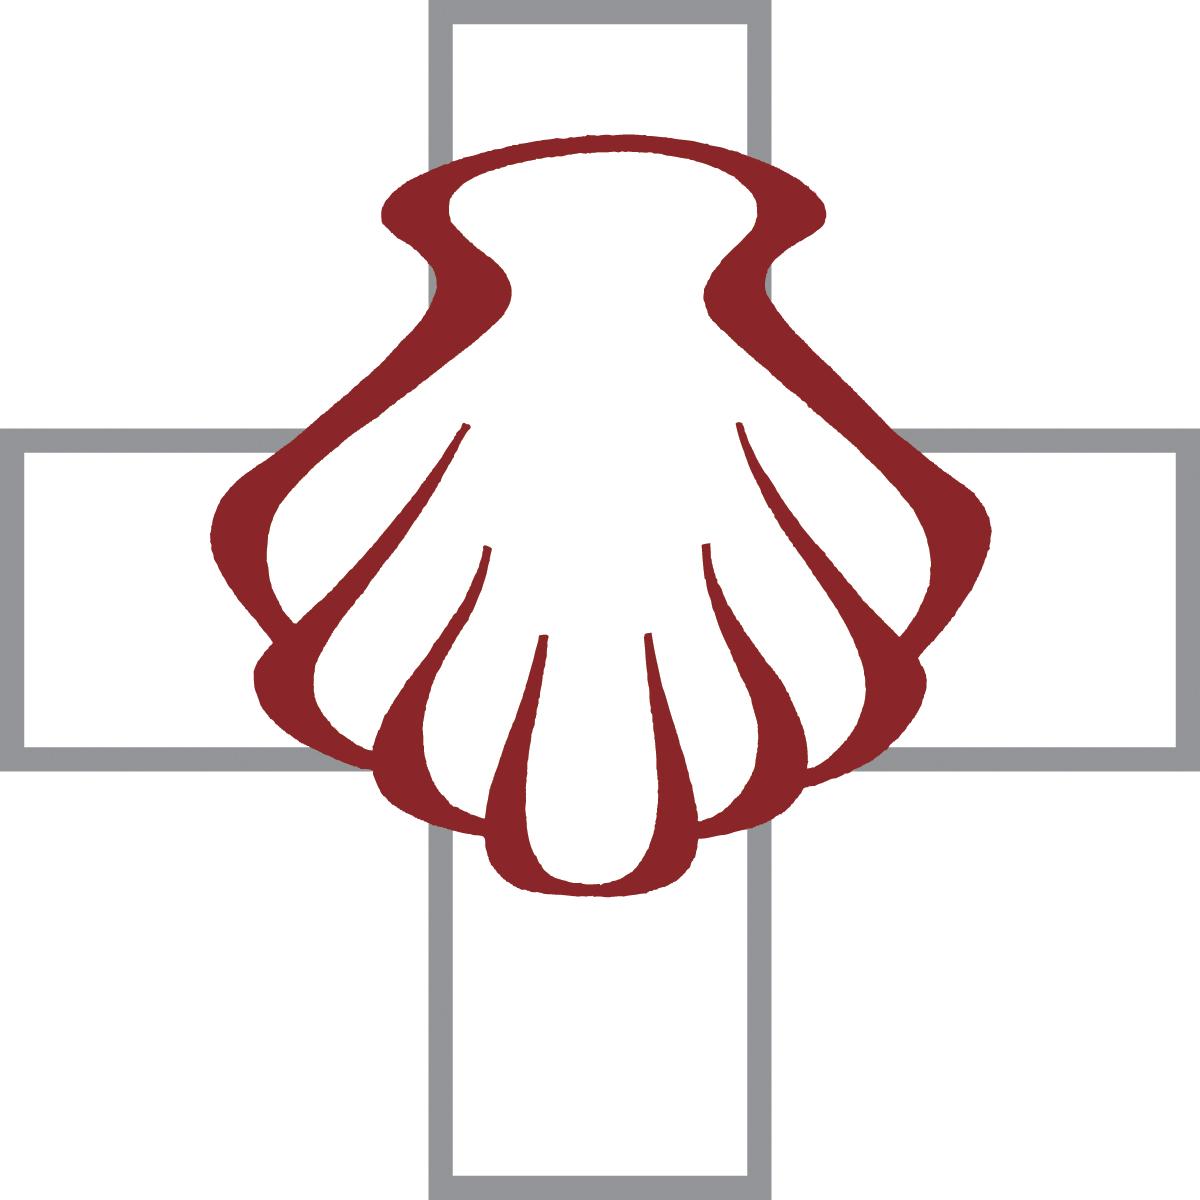 Symbol clipart lutheran Symbols Download Symbols Lutheran Baptism